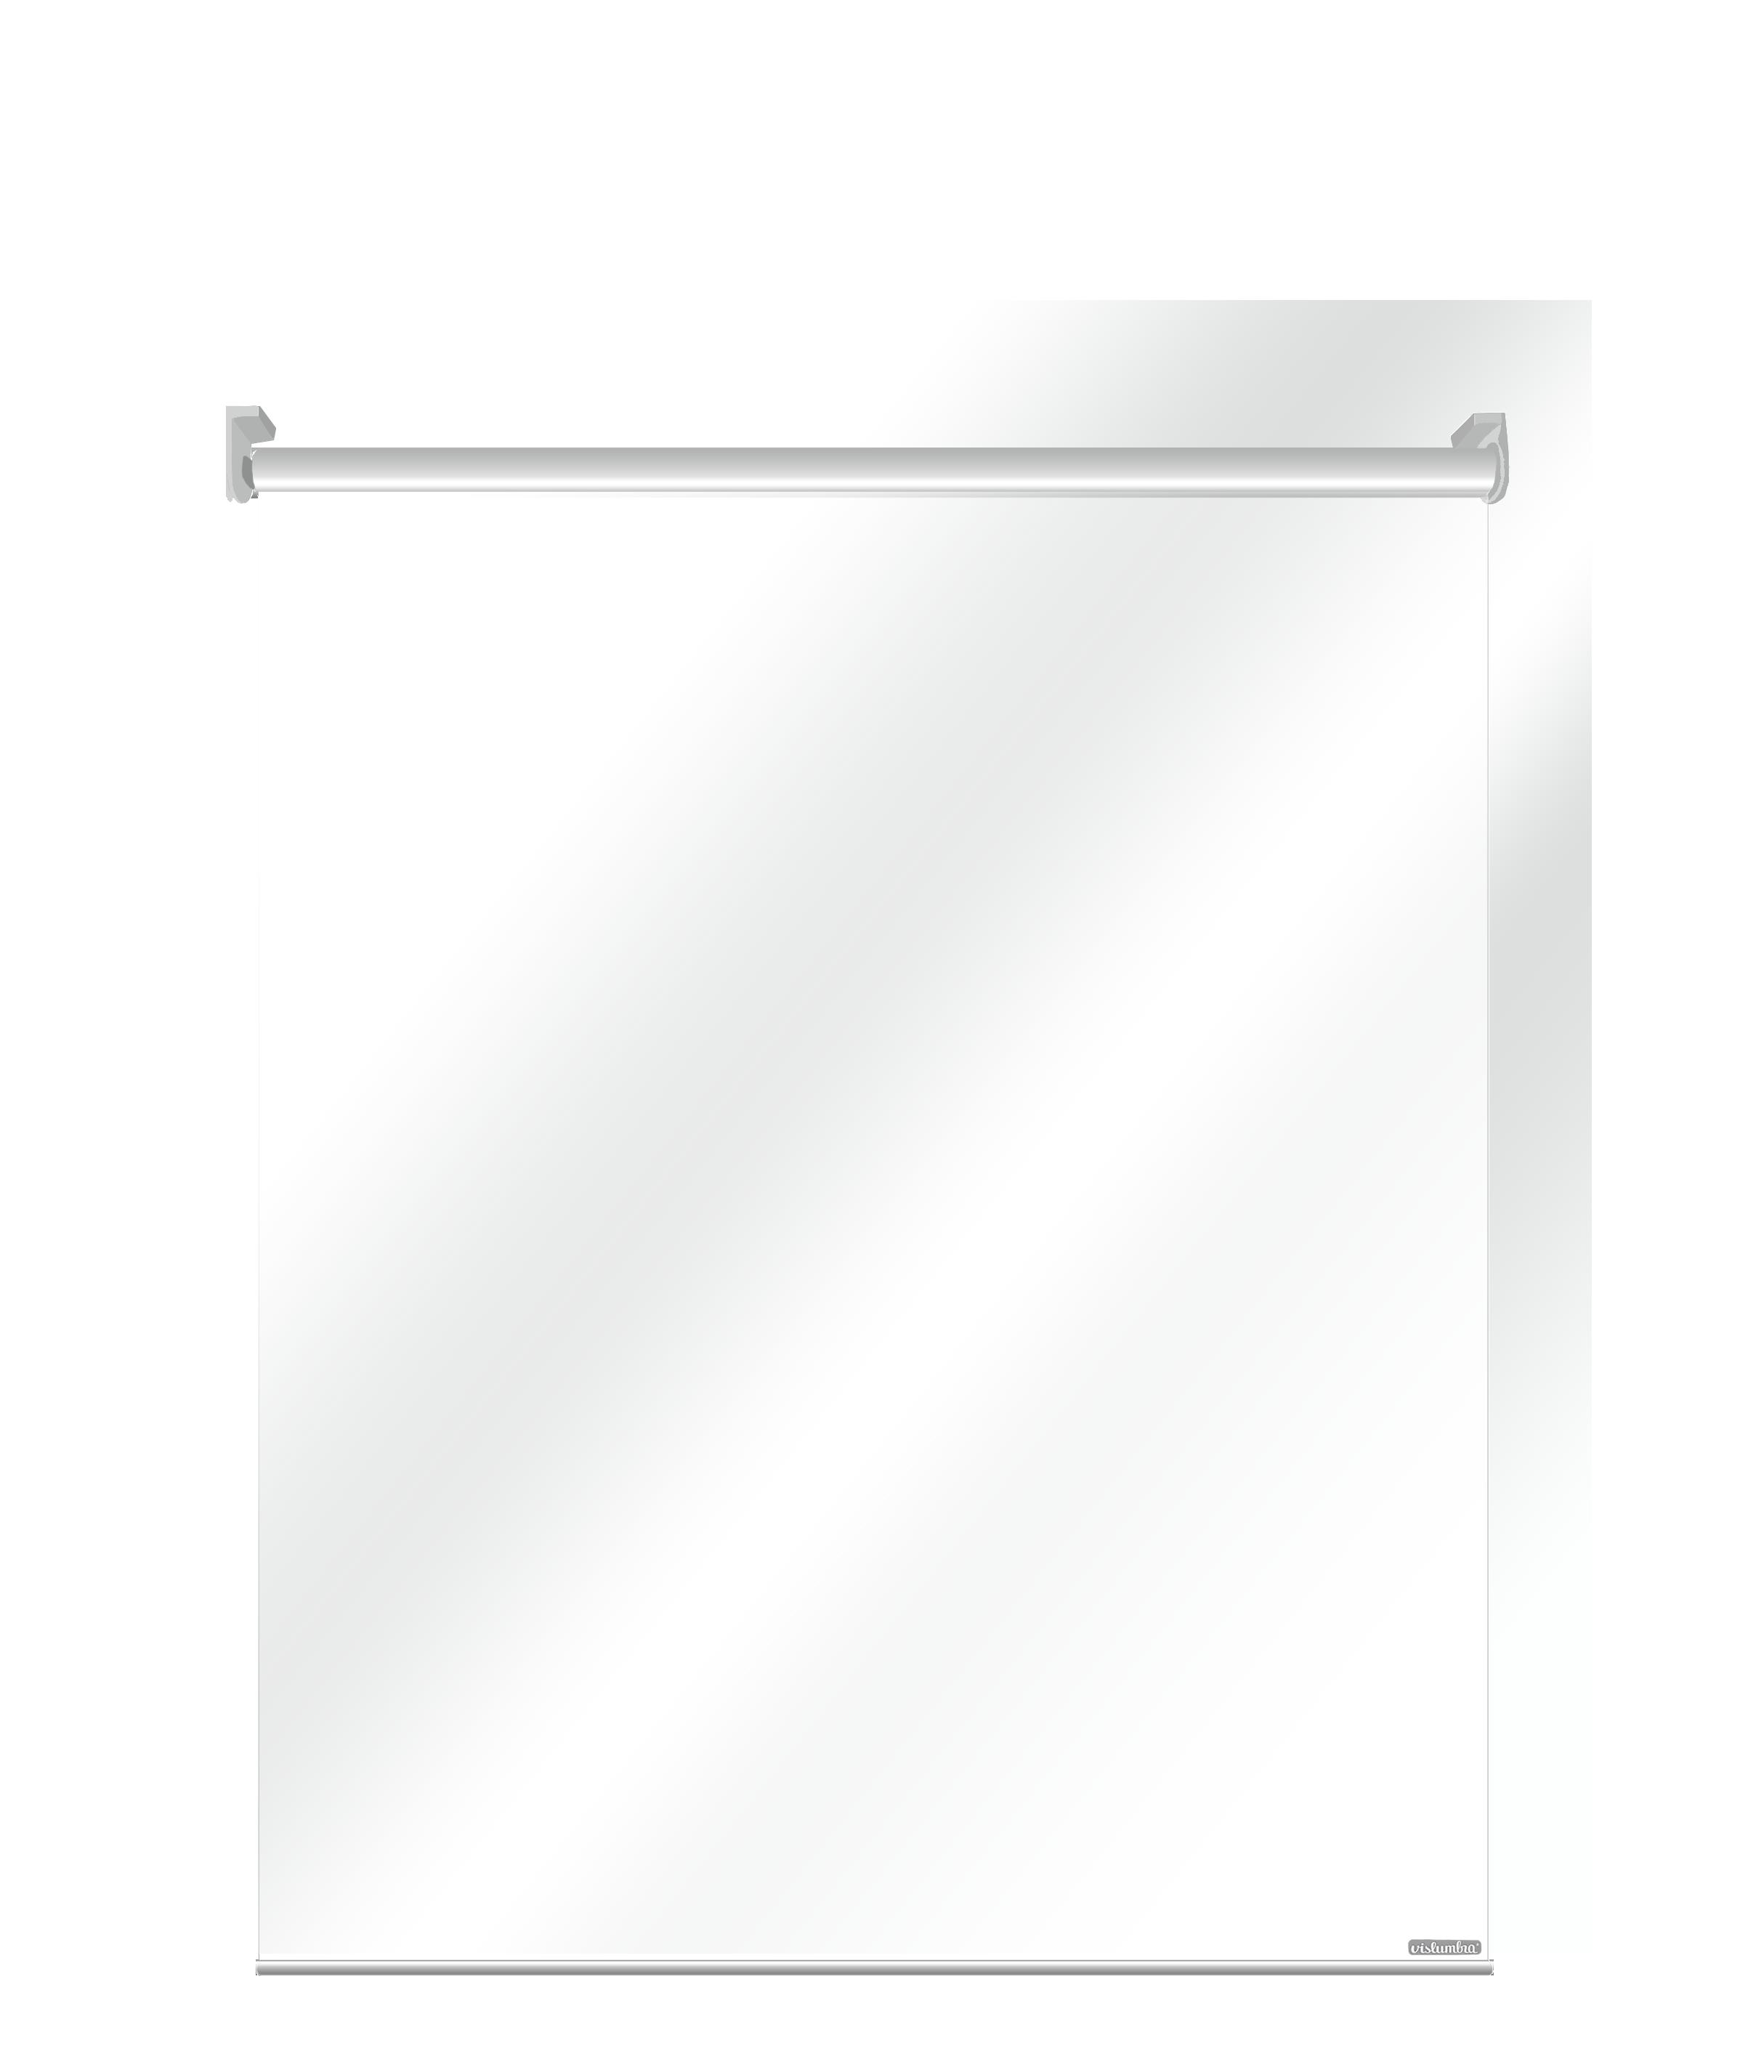 CleanGlass Vislumbra muelle